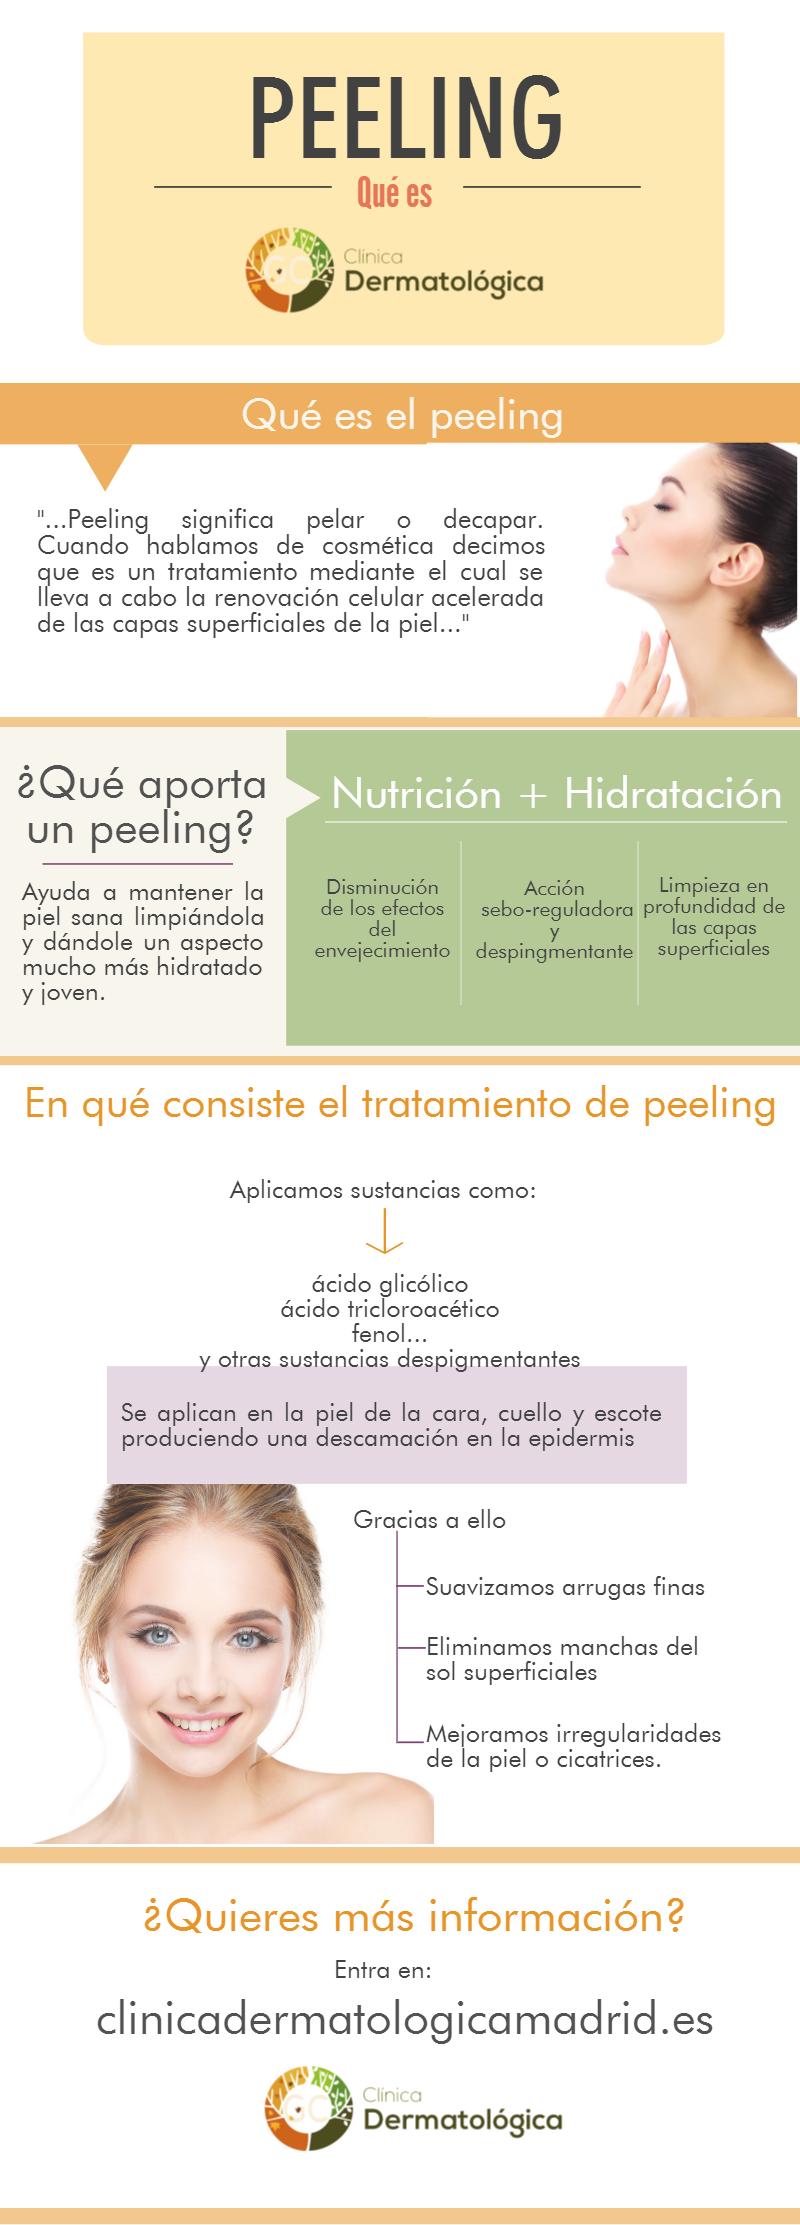 Peeling Clinica dermatologica